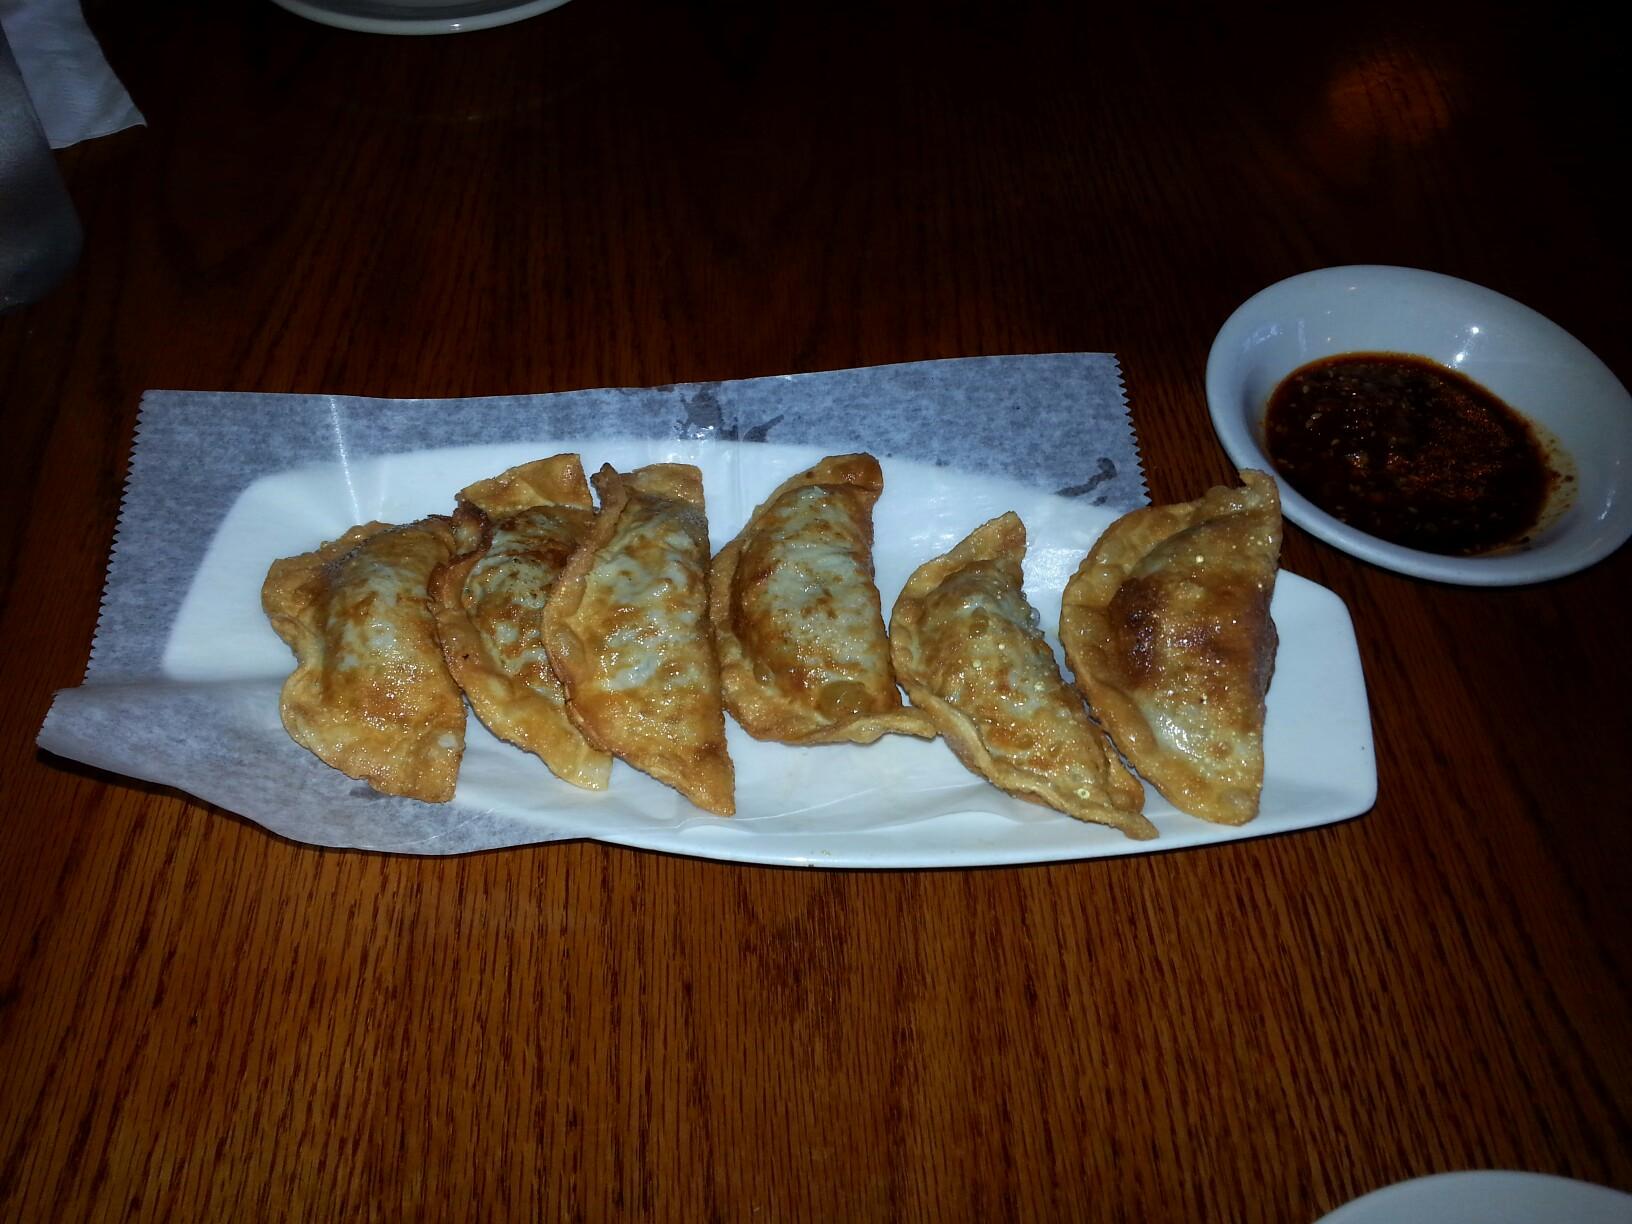 Seoul Garden Korean Restaurant 10678 Saint Charles Rock Rd, Saint ...